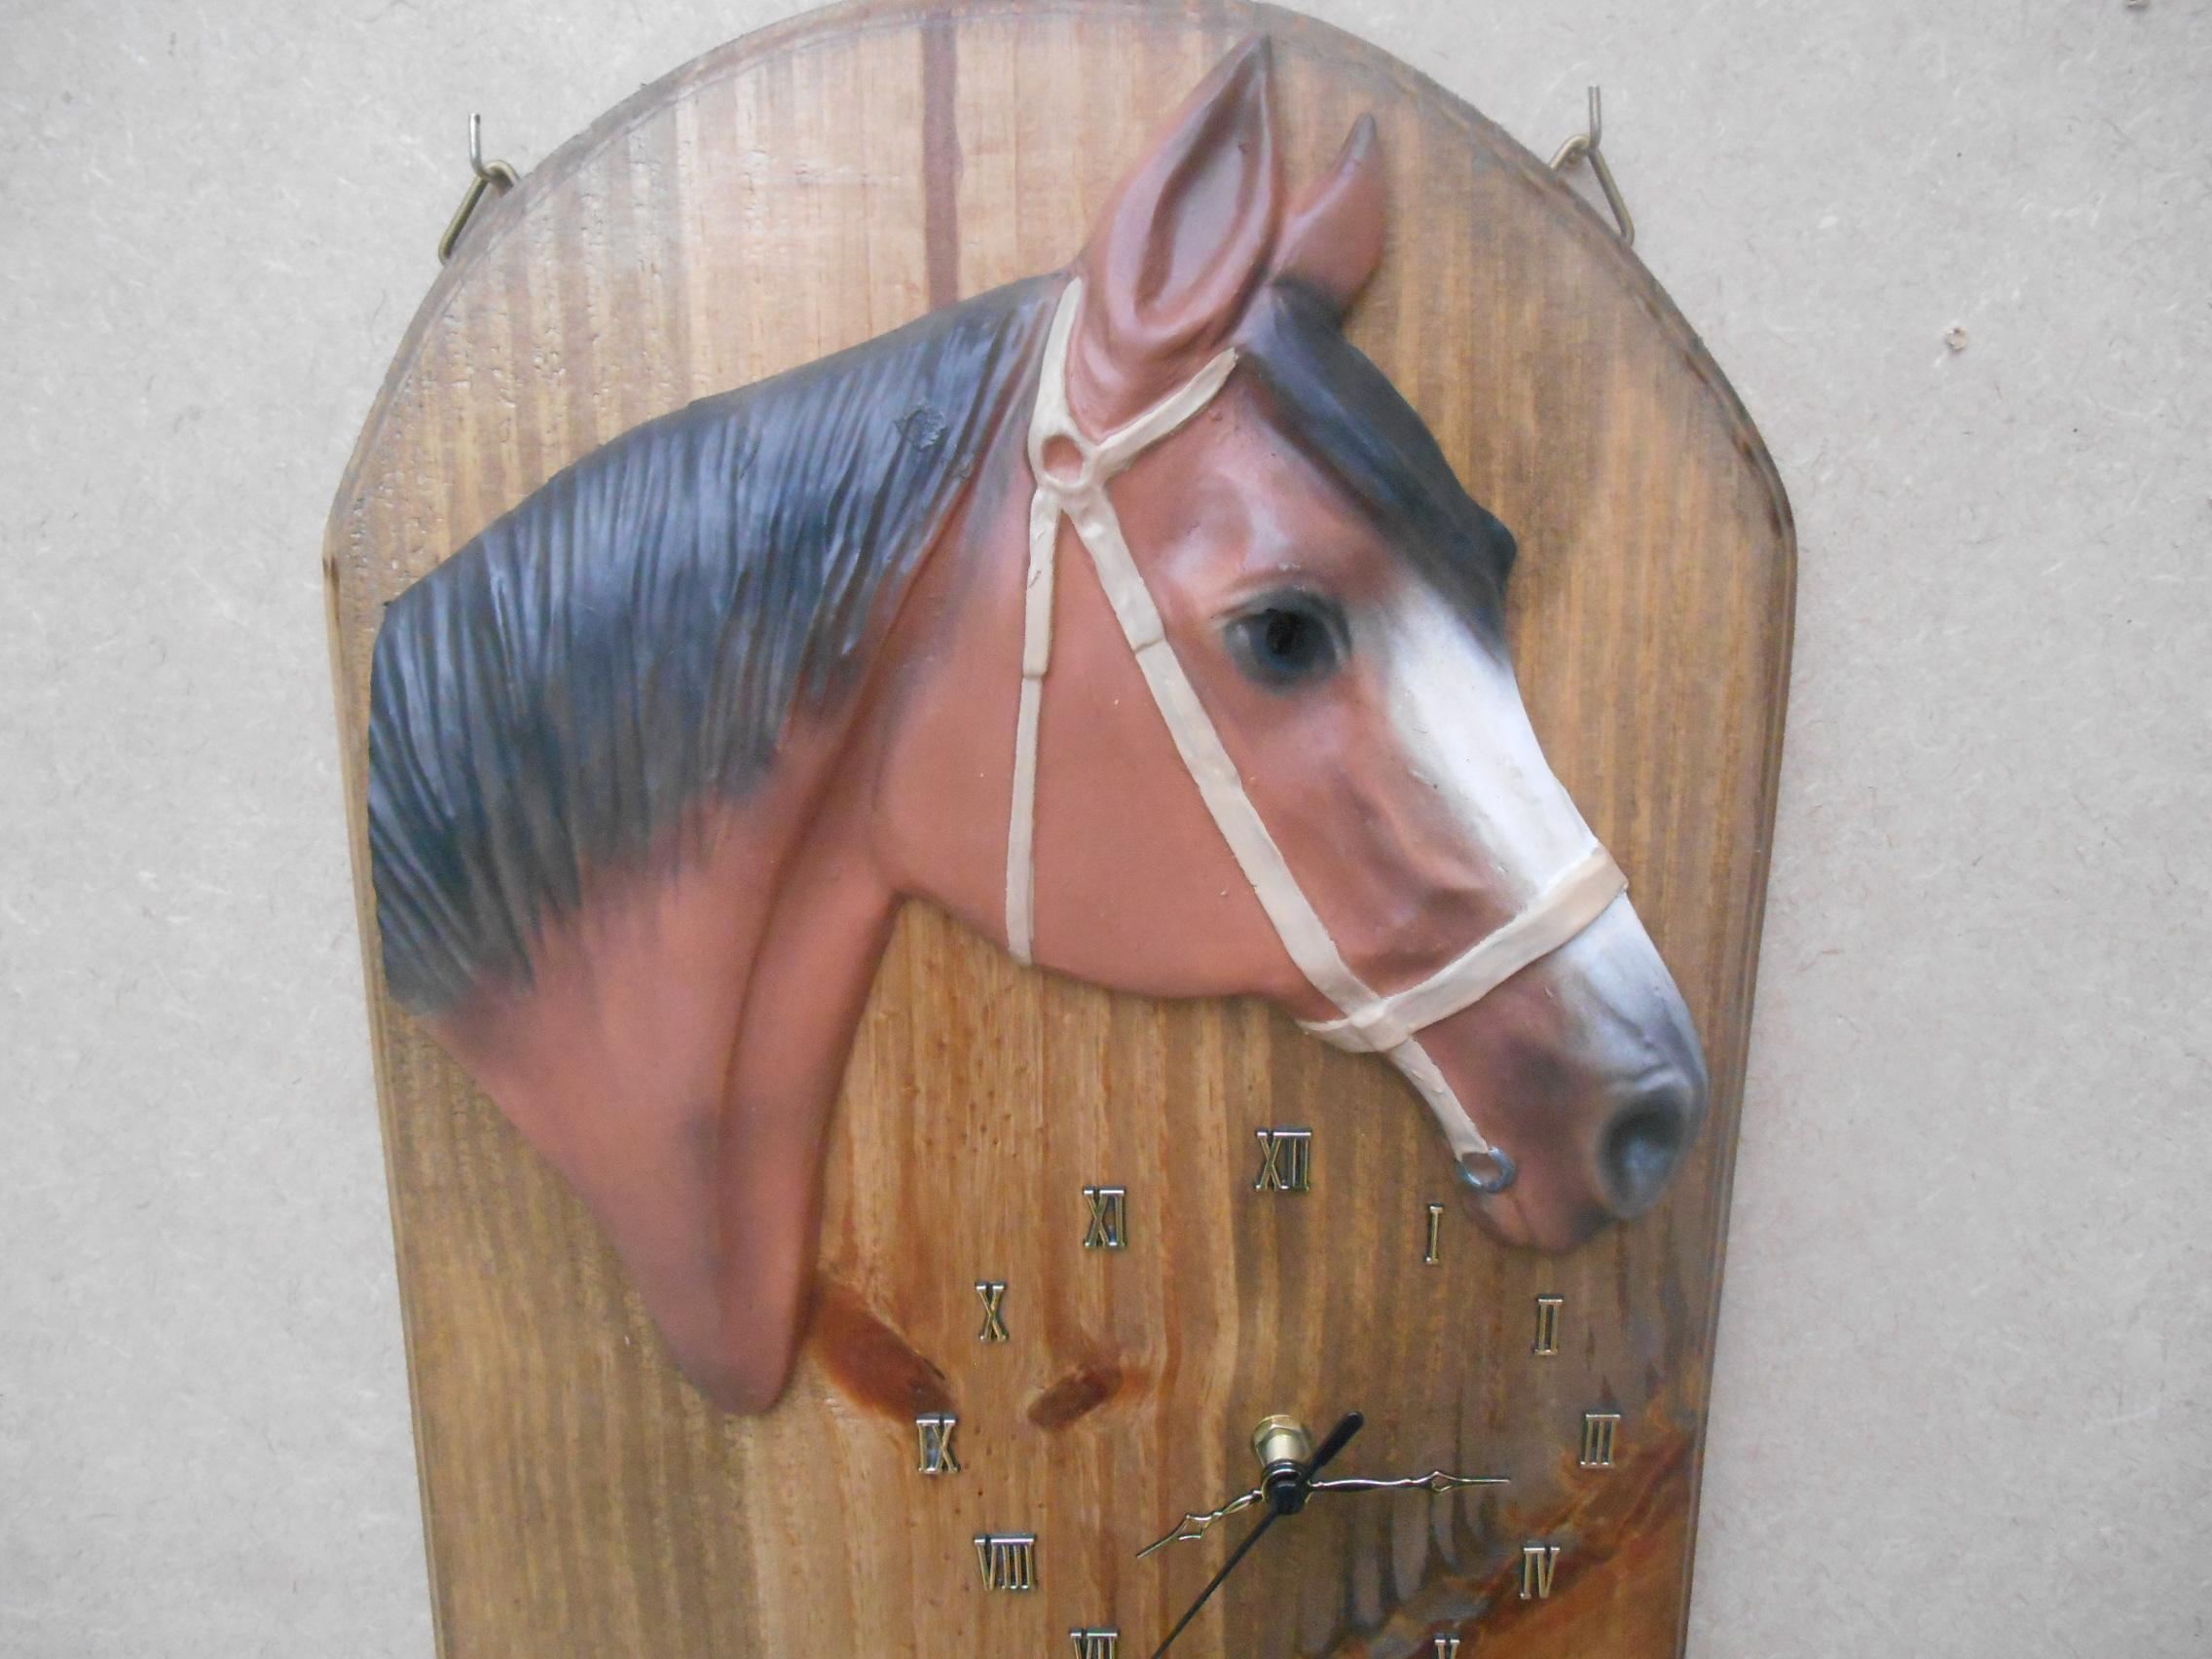 Artesanato Lider Sao Paulo ~ Relógio de Parede Cavalo Alegrete Artes Elo7